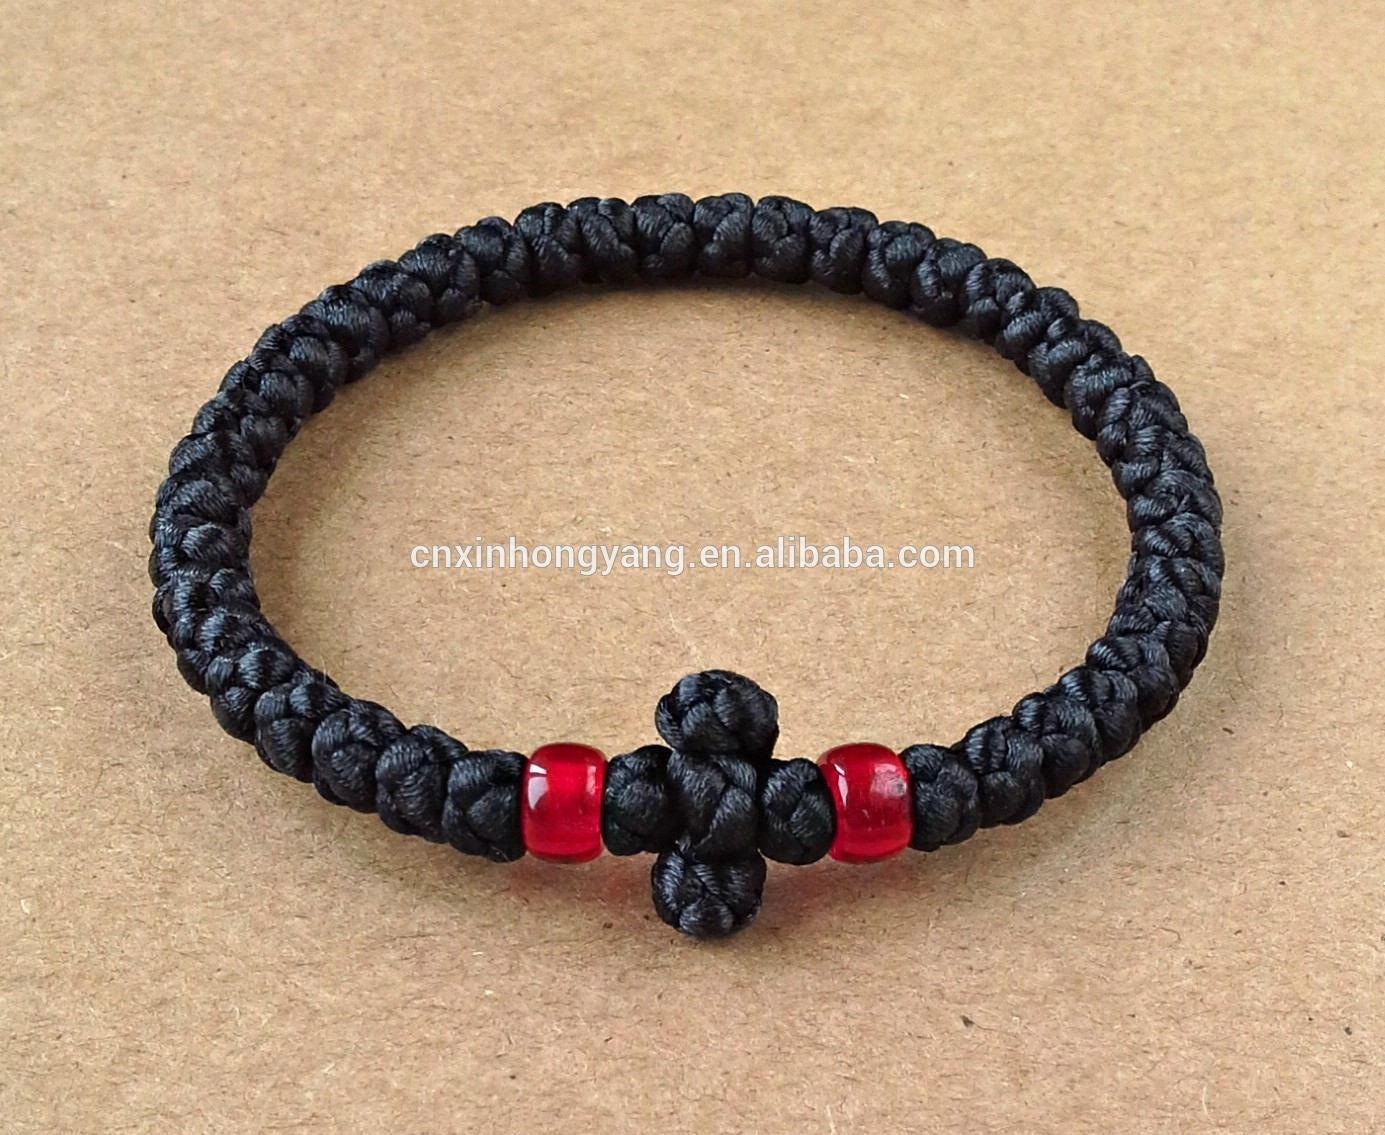 Orthodox Knot Prayer Ropes,Handmade Komboskini Necklace,Religious Jewelry  Gift,Wool/waxed Cord Christian Bracelet - Buy Waxed Cotton Cord